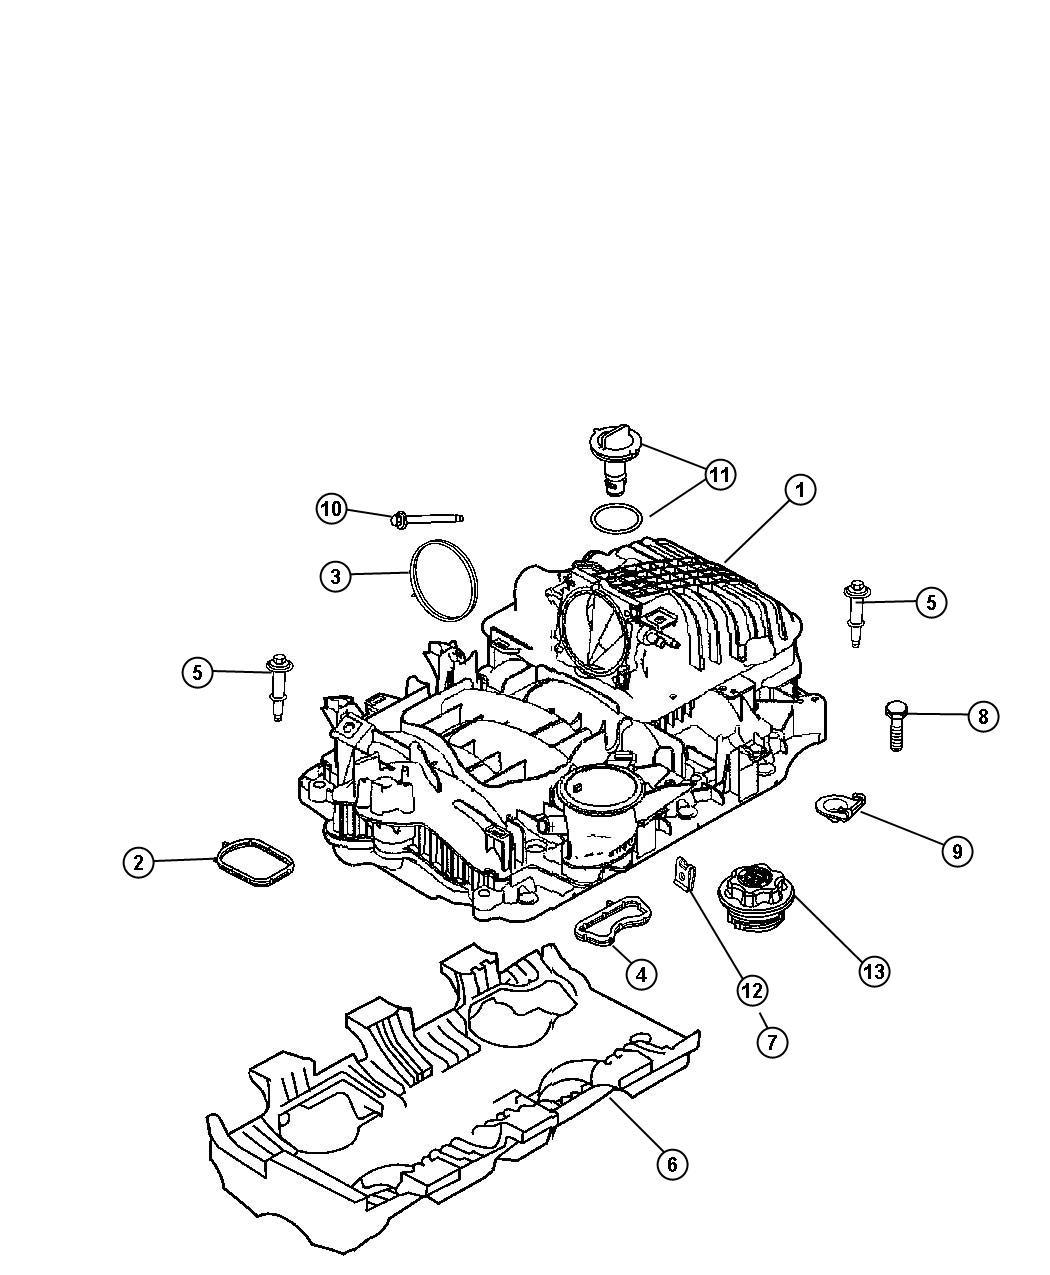 Chrysler Aspen Intake Manifold Uninstall